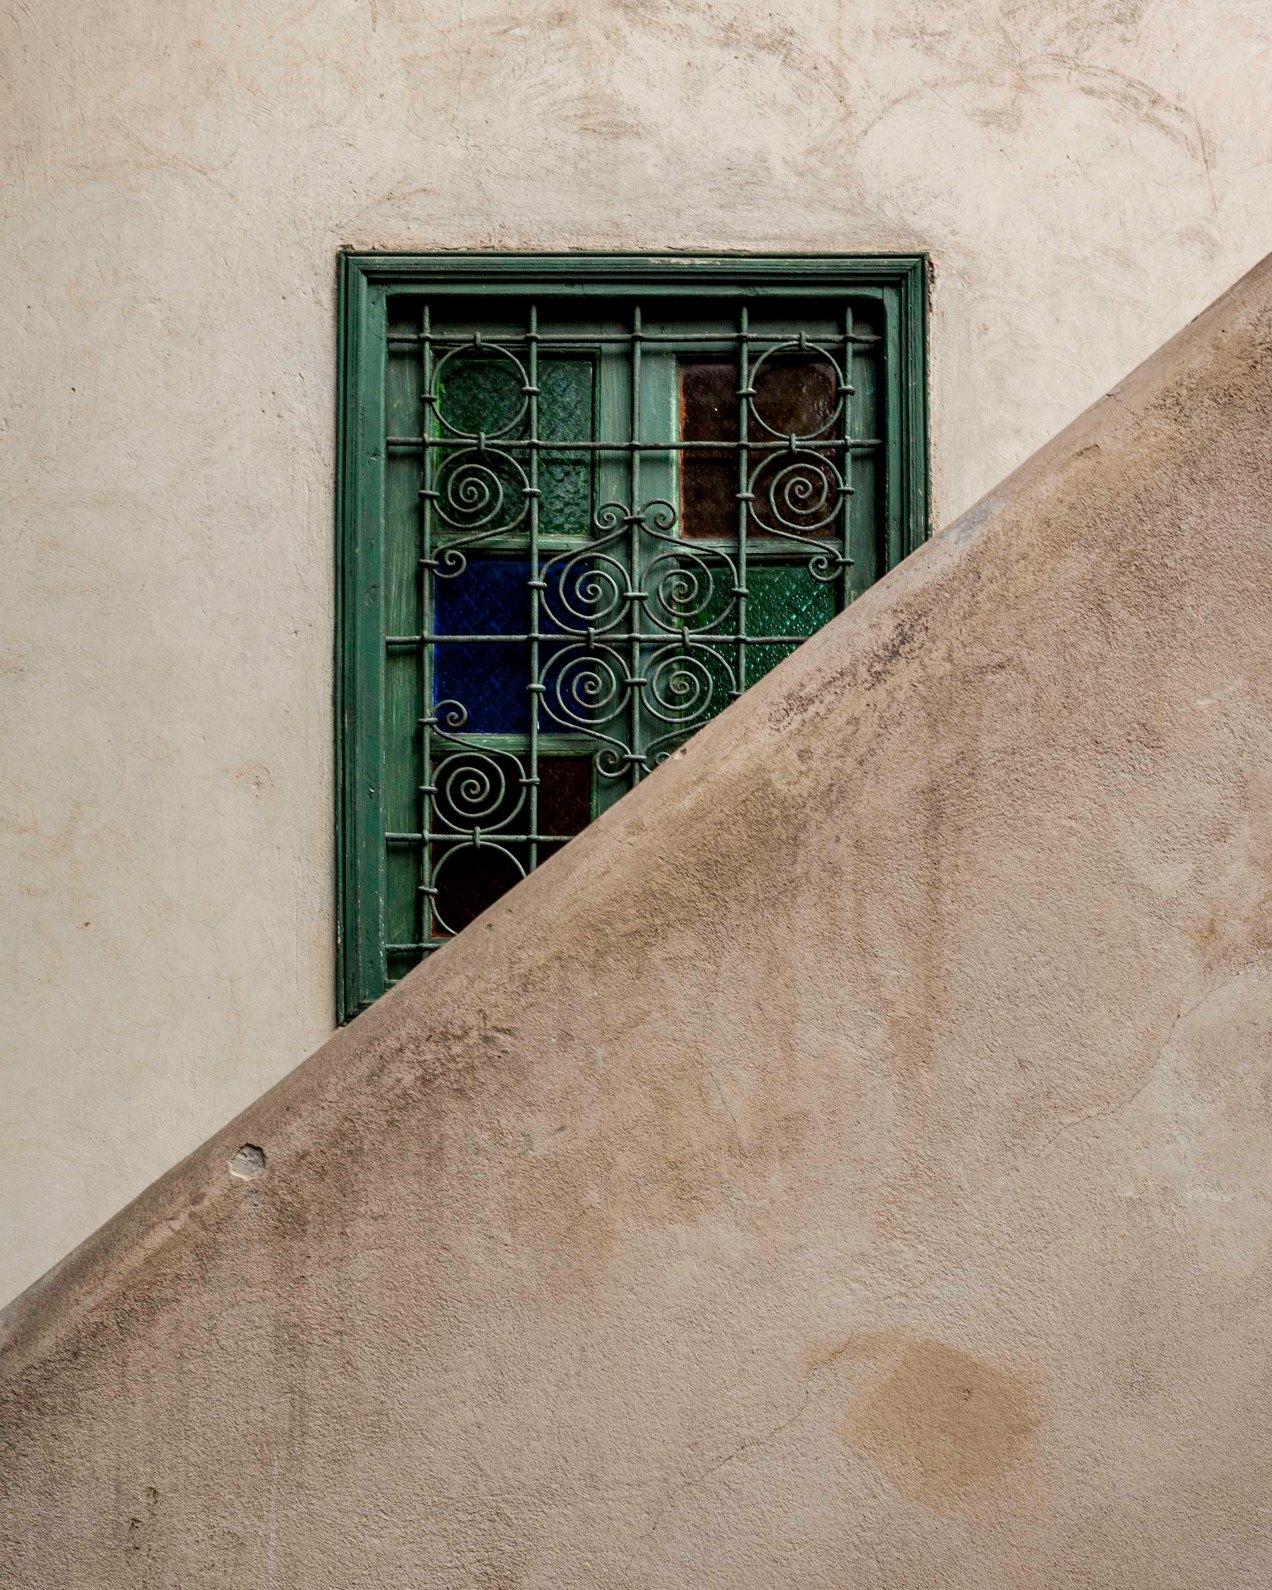 La rampe, le jardin des Biehn, Fès, Maroc, gildalliere, 2014